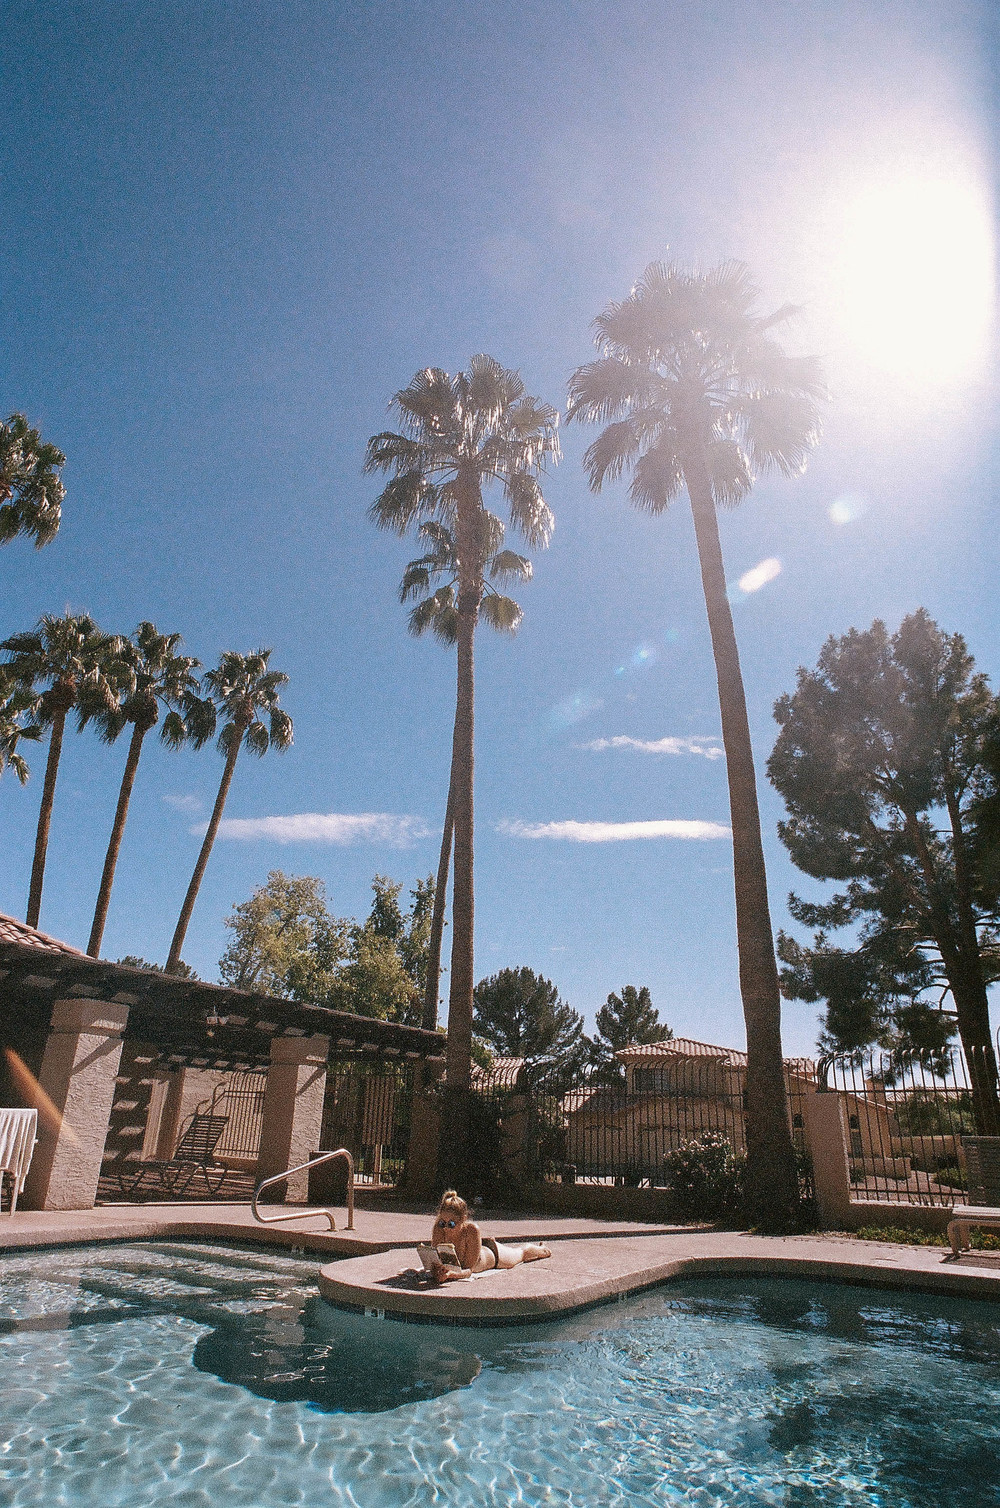 Lilly in Arizona